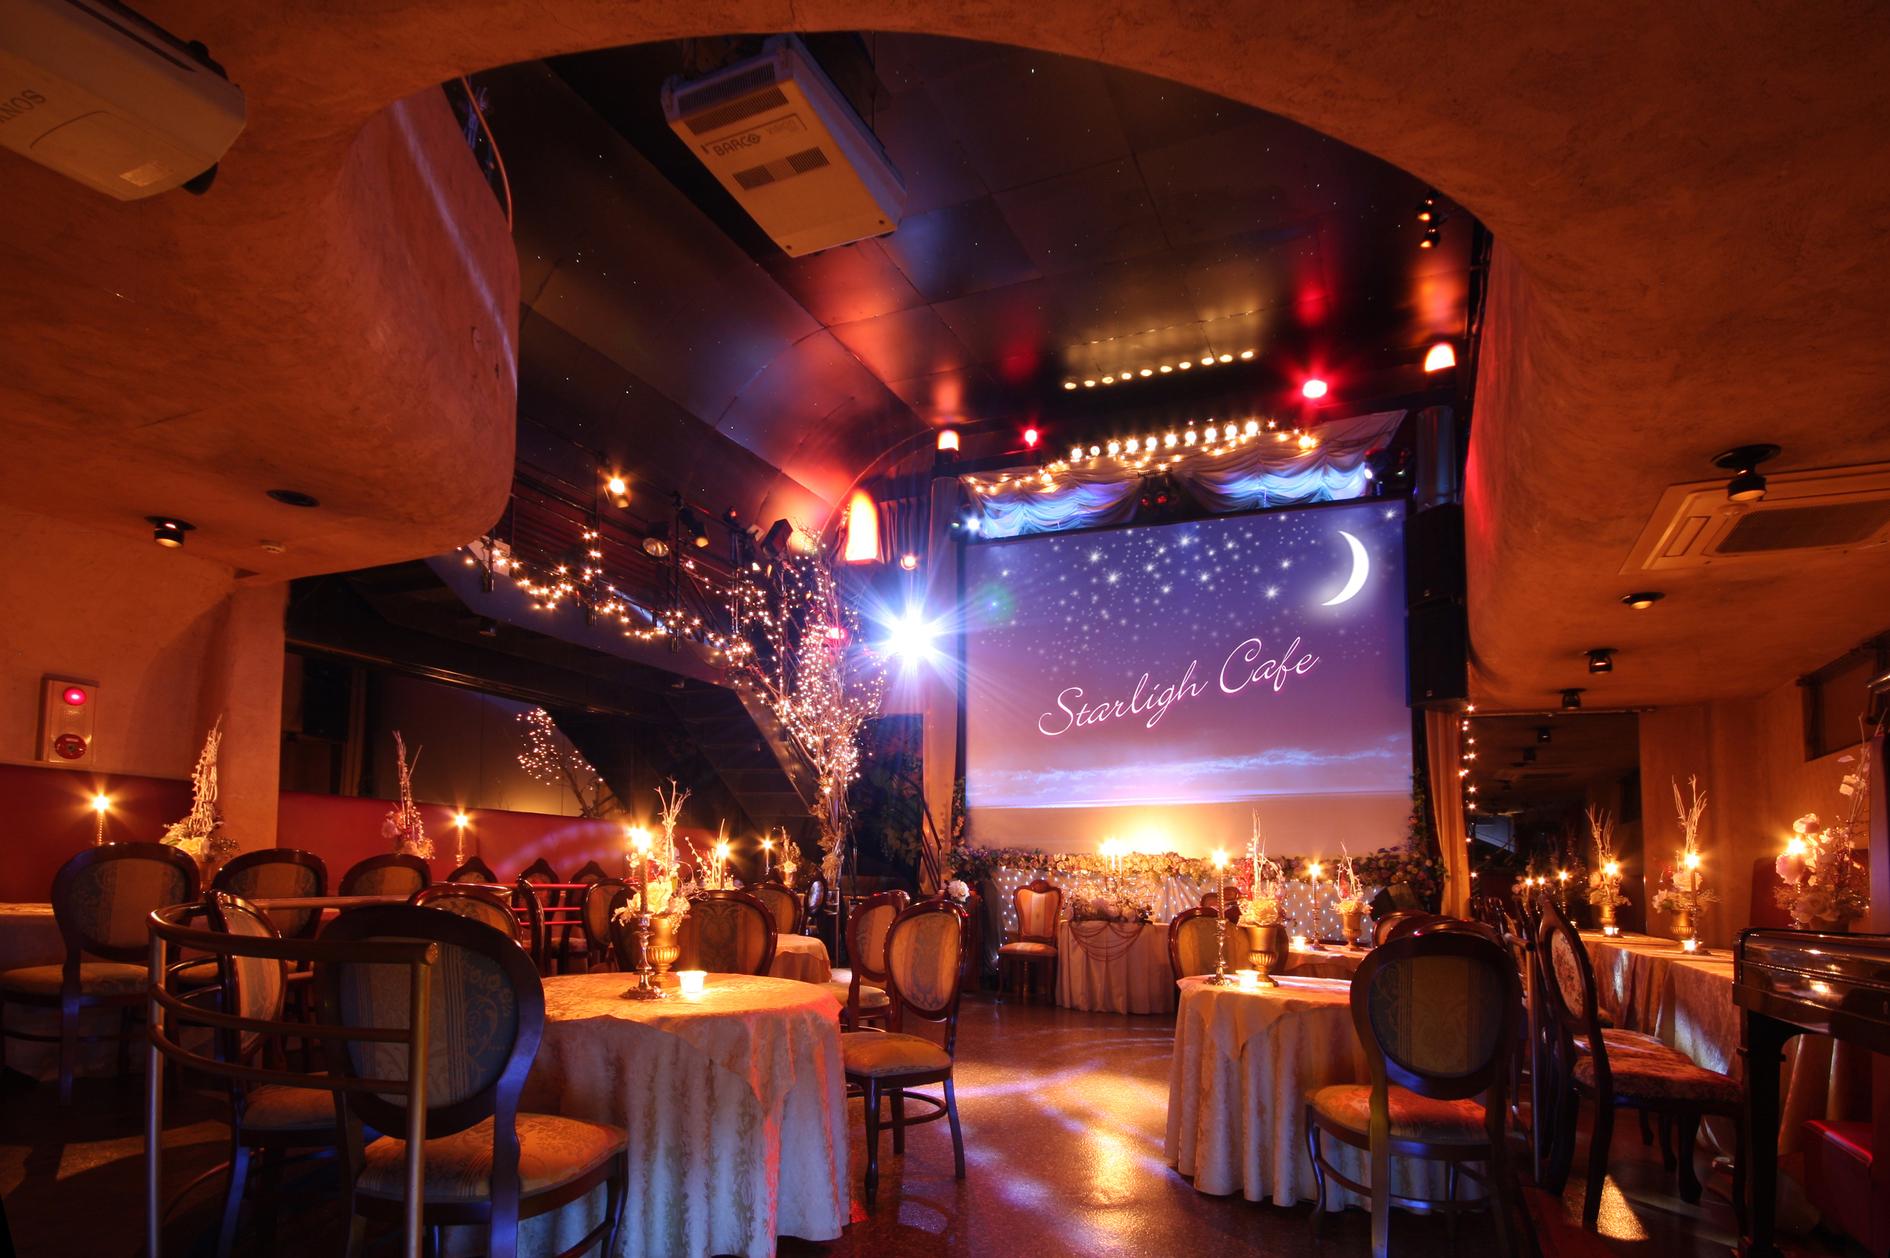 STARLIGHT CAFE 2&3階(スターライト カフェ&ウエディング 熊本) の写真0